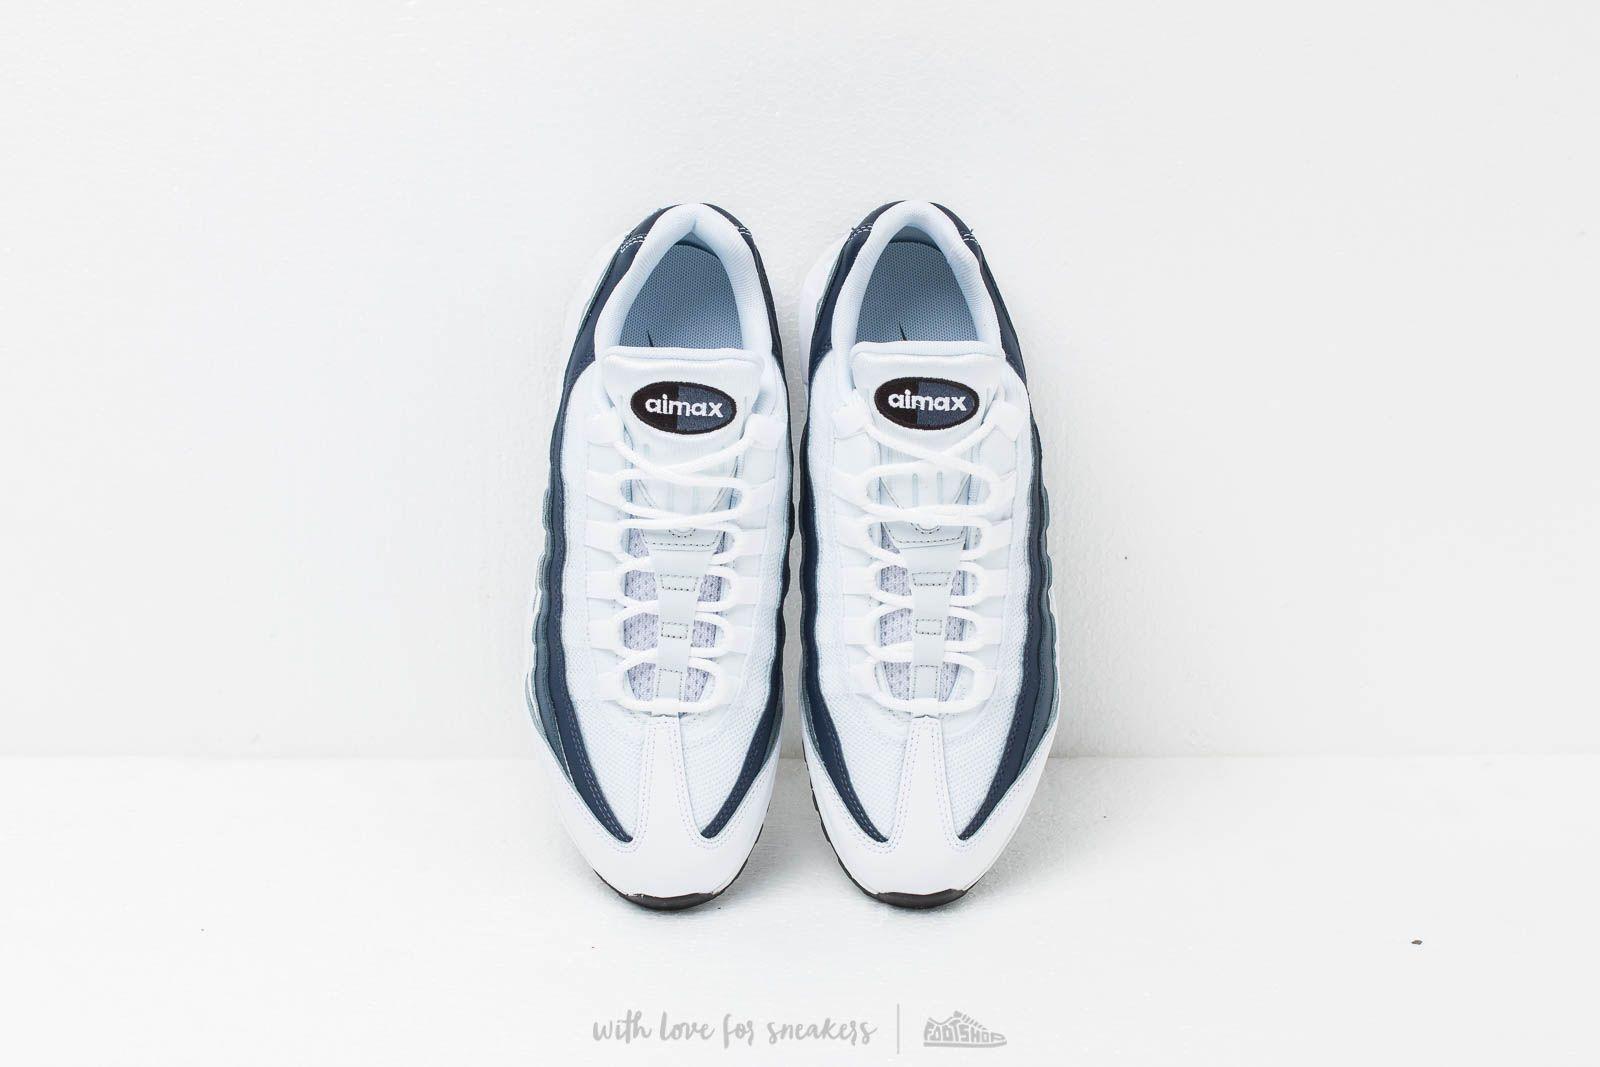 Nike Air Max 95 Essential White  White-Midnight Navy-Monsoon Blue at a 4f8f52204